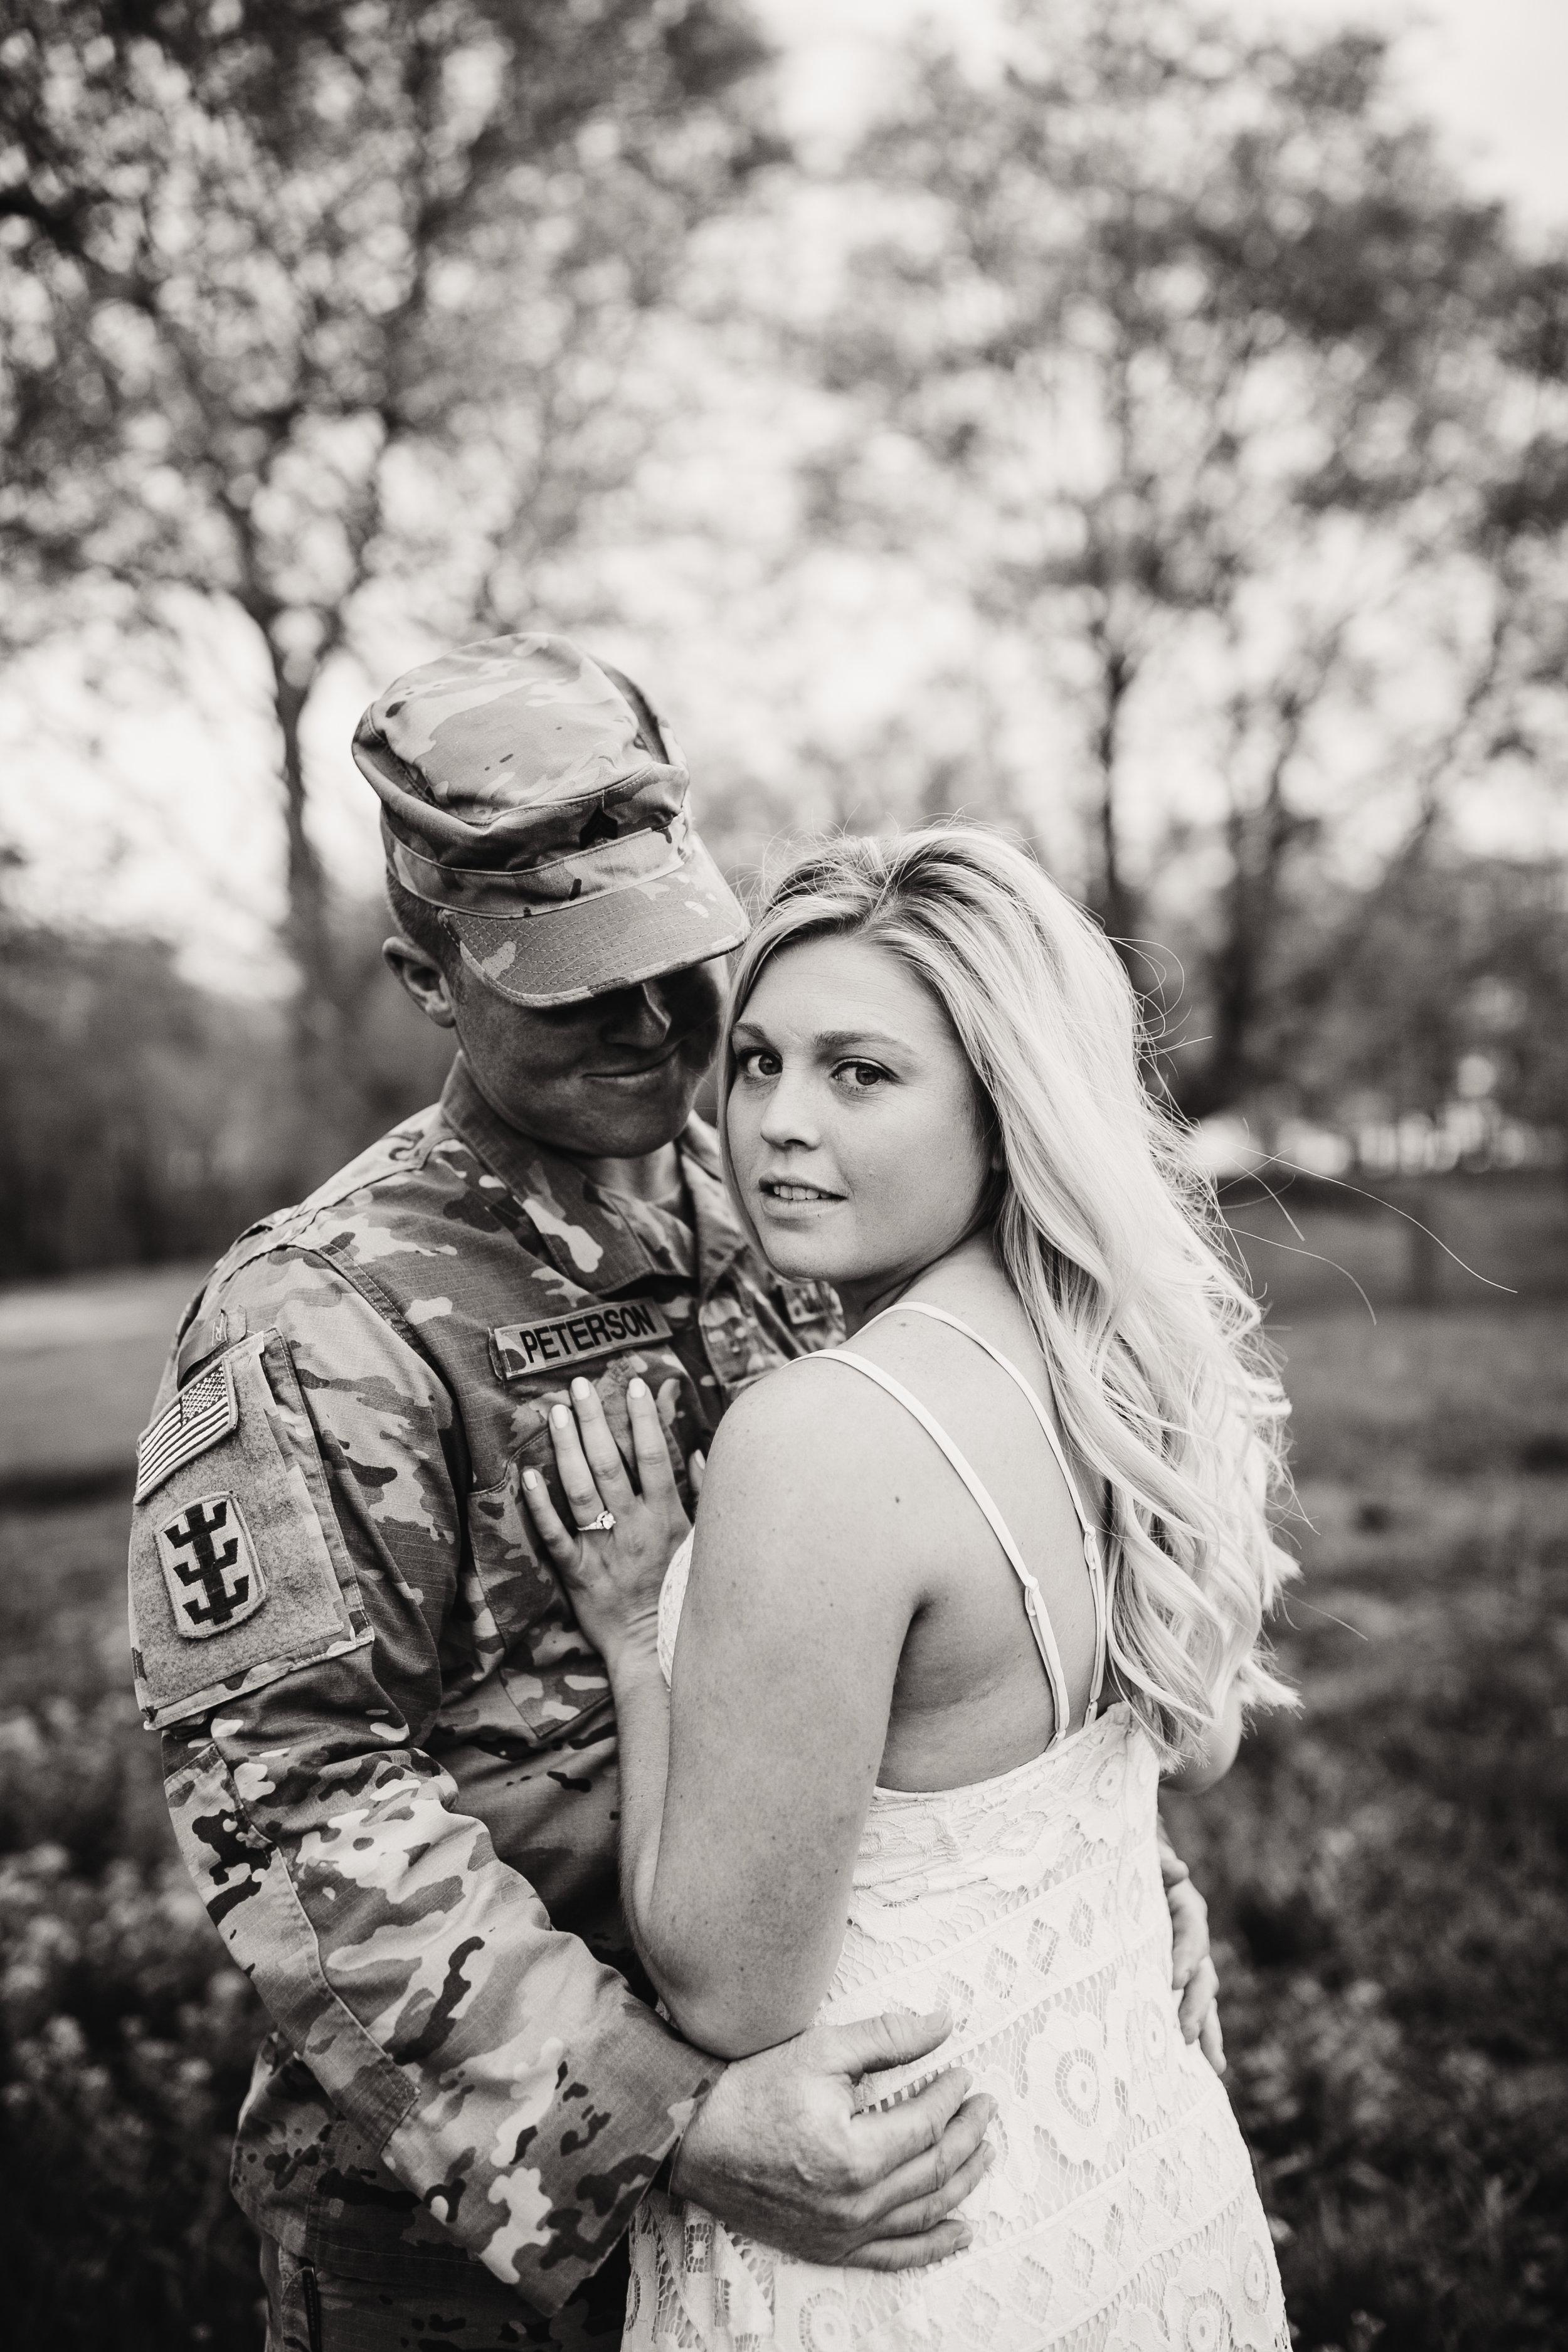 gracetphotography-wedding-photographer-adventure-bride-engagement-25.jpg